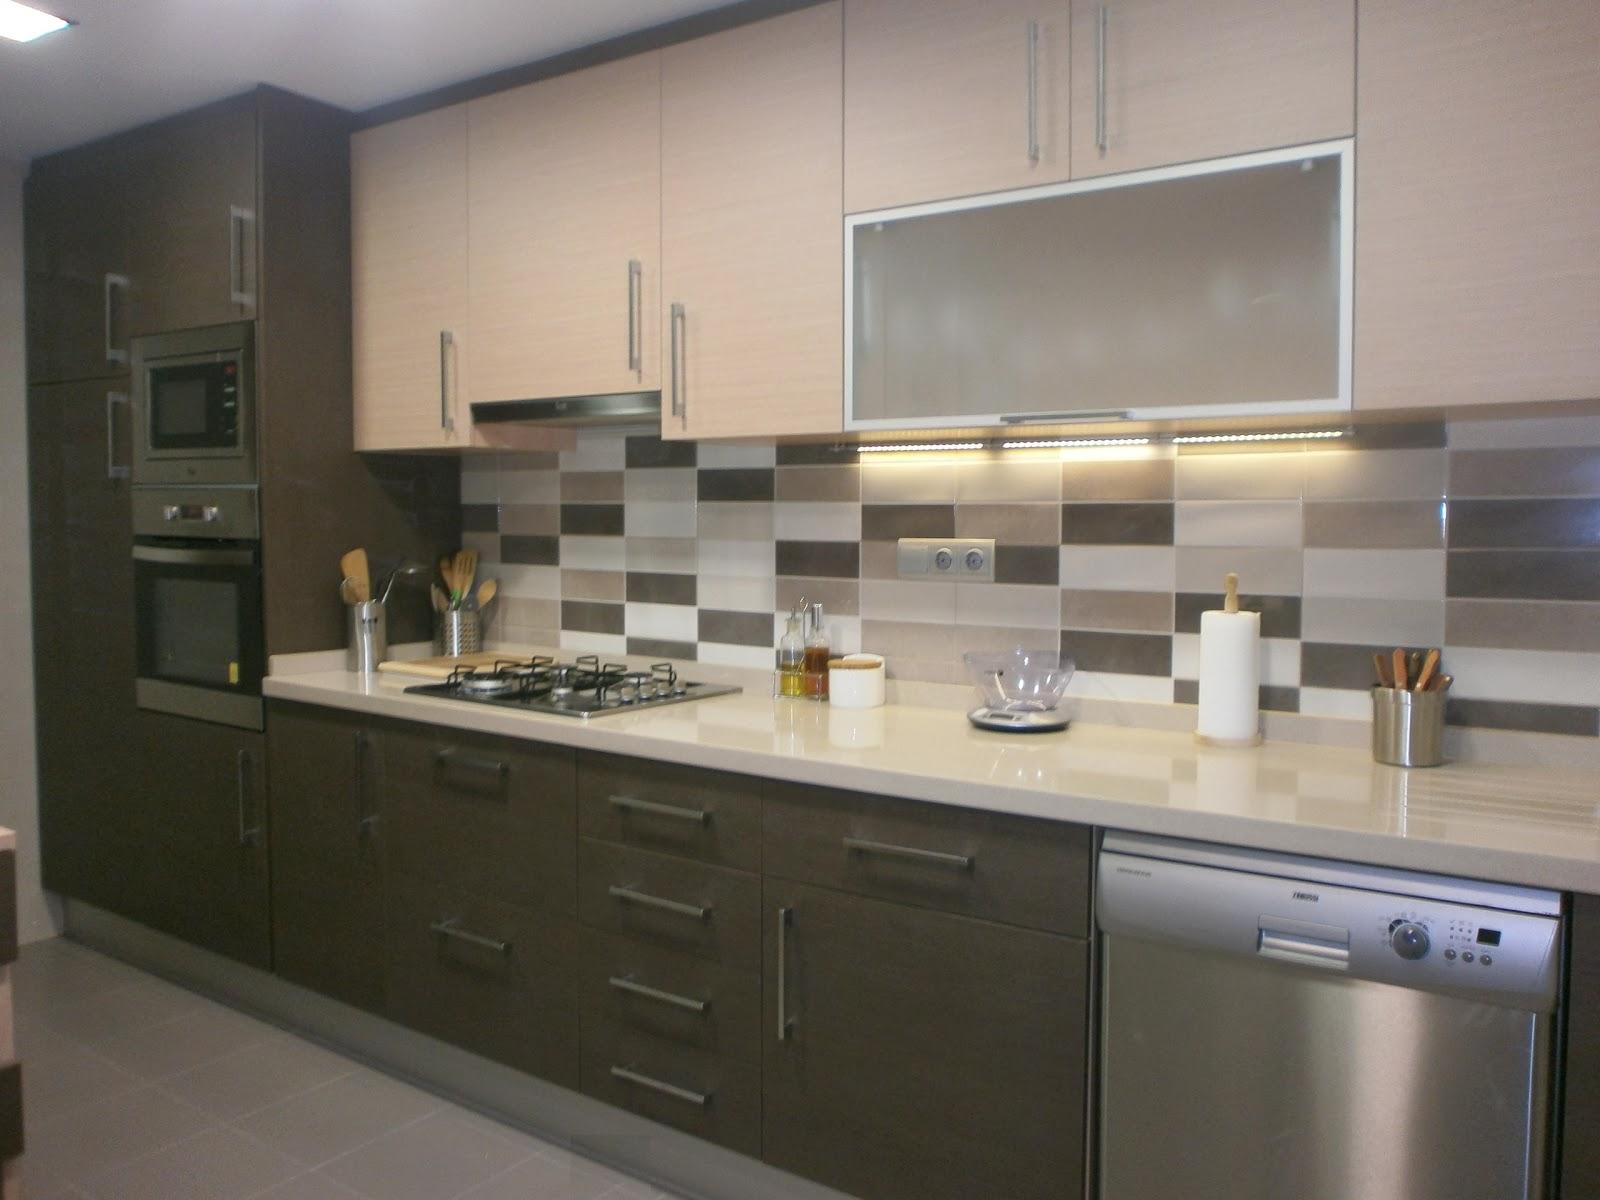 Dise o intemporal una sobria cocina en dos tonos - Catalogos de azulejos para cocinas ...